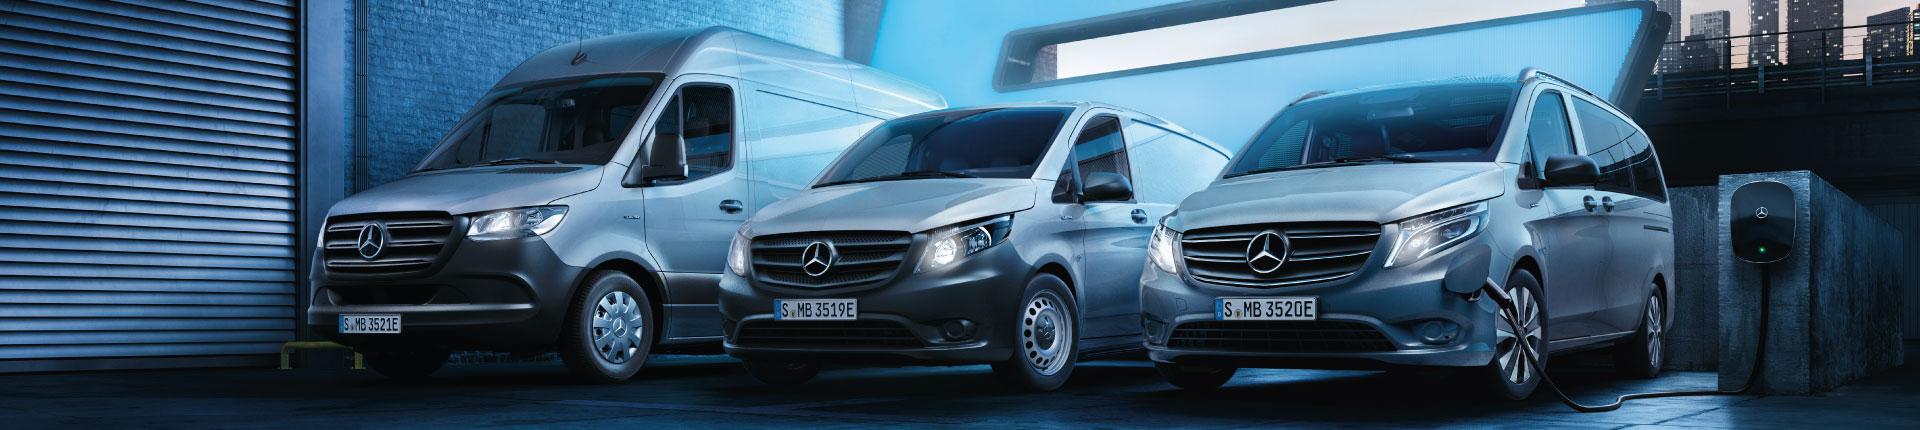 Max Schultz Automobile eVans Transporter